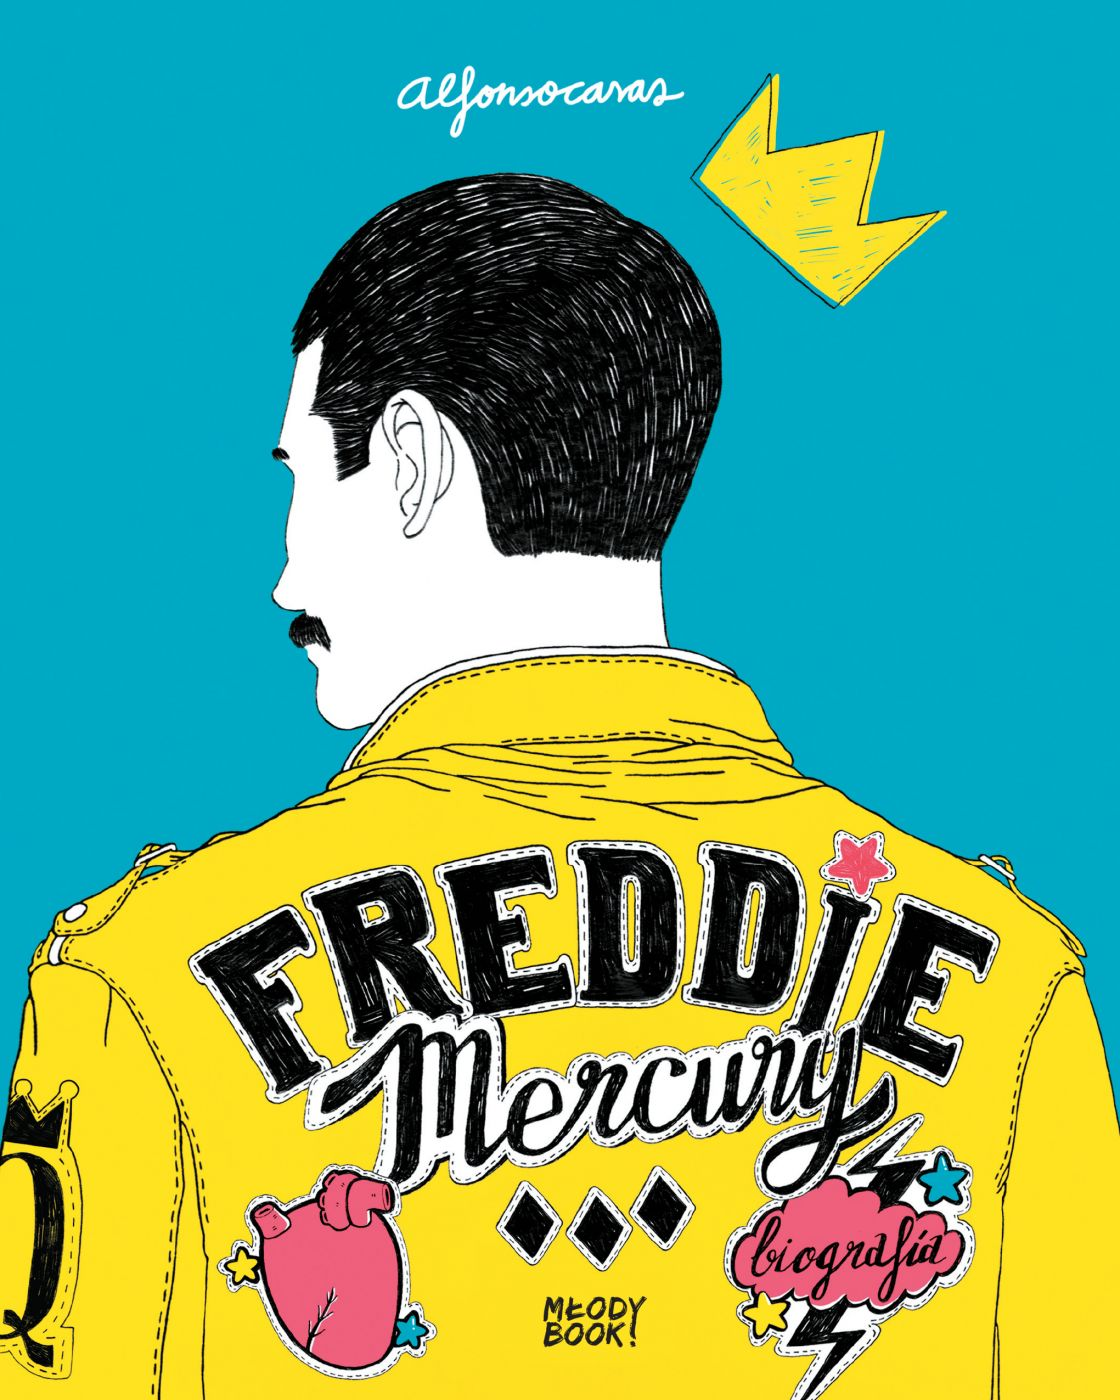 Alfonso Casas-Freddie Mercury. Biografia